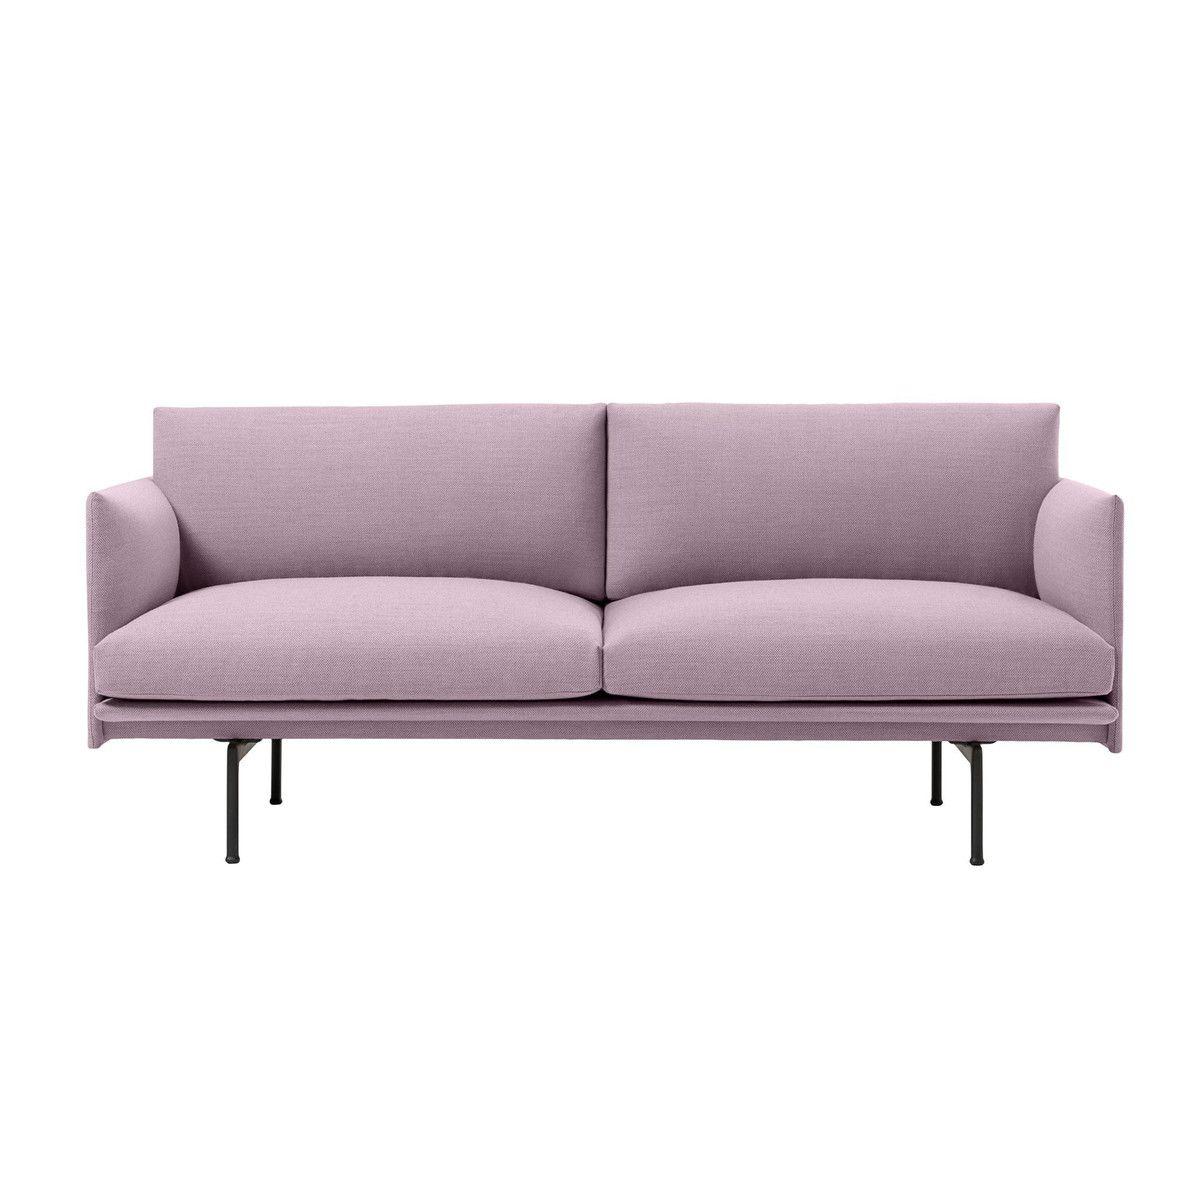 Sofa stoff  Outline Sofa 2 Seater | Muuto | AmbienteDirect.com